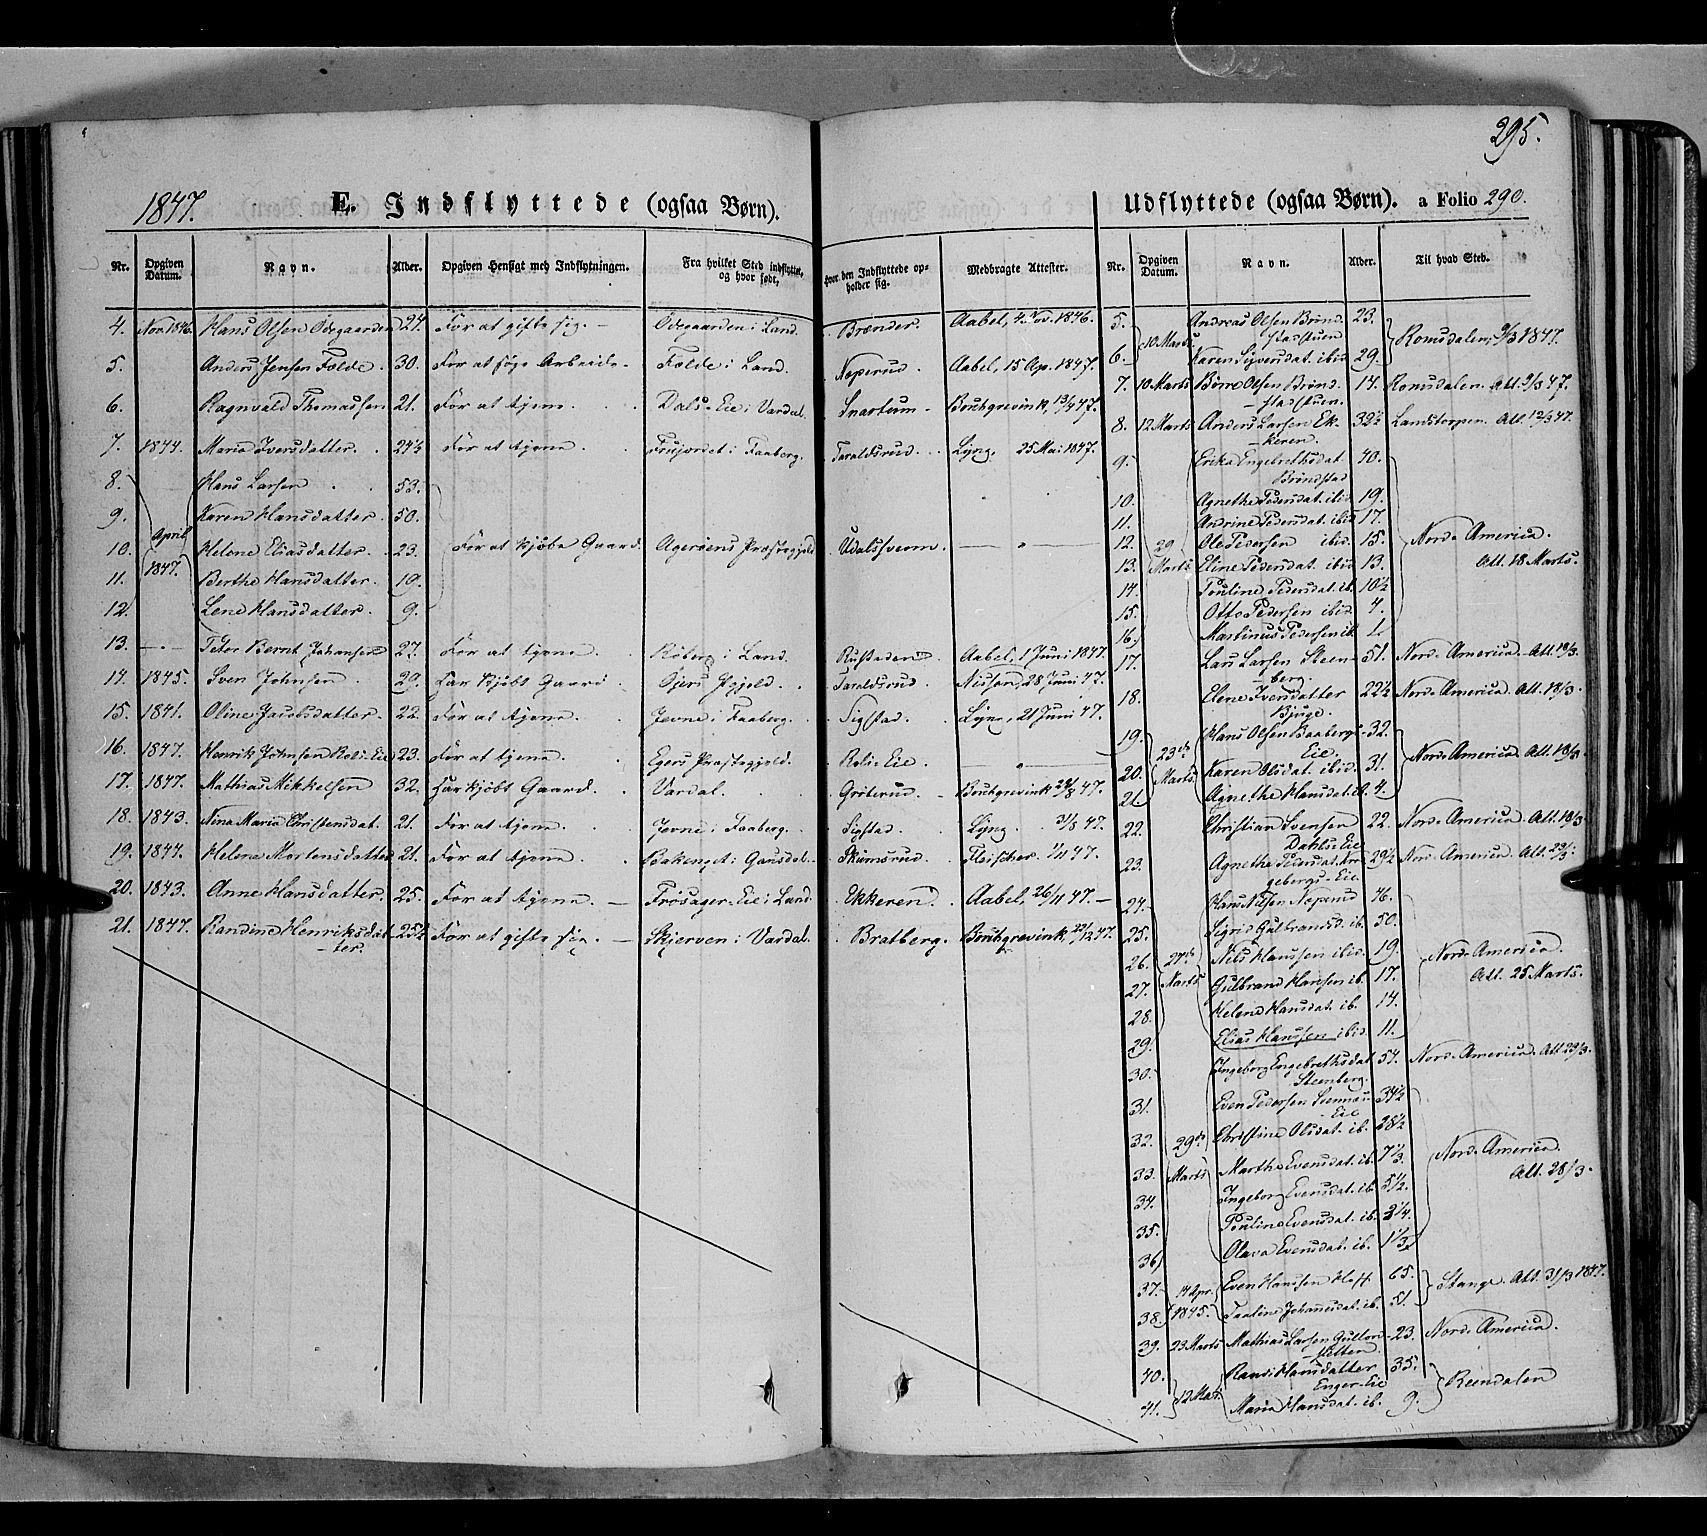 SAH, Biri prestekontor, Ministerialbok nr. 5, 1843-1854, s. 295